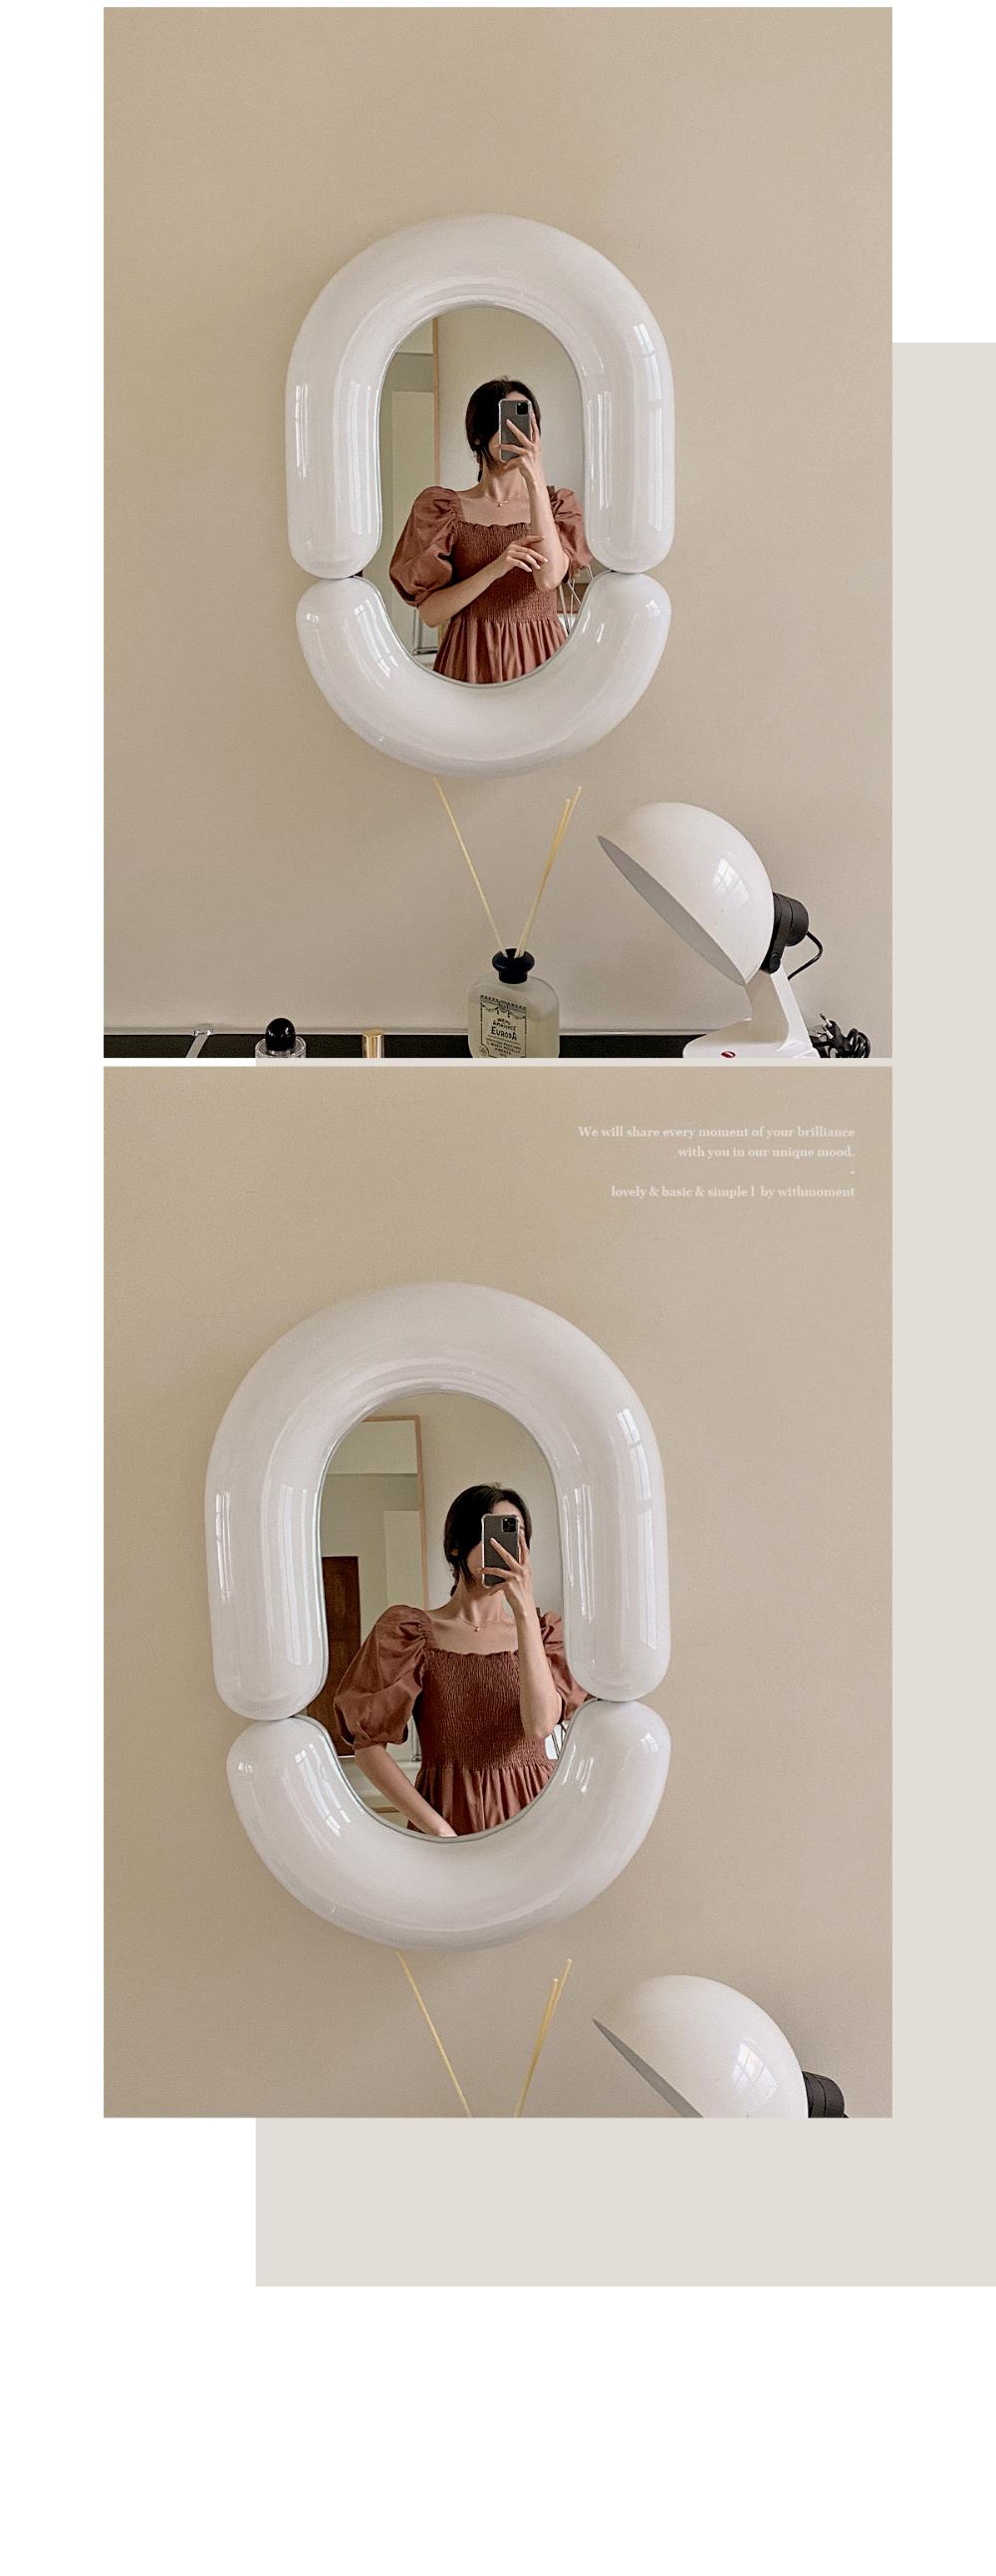 Mode Smoke Balloon Dress - 2color